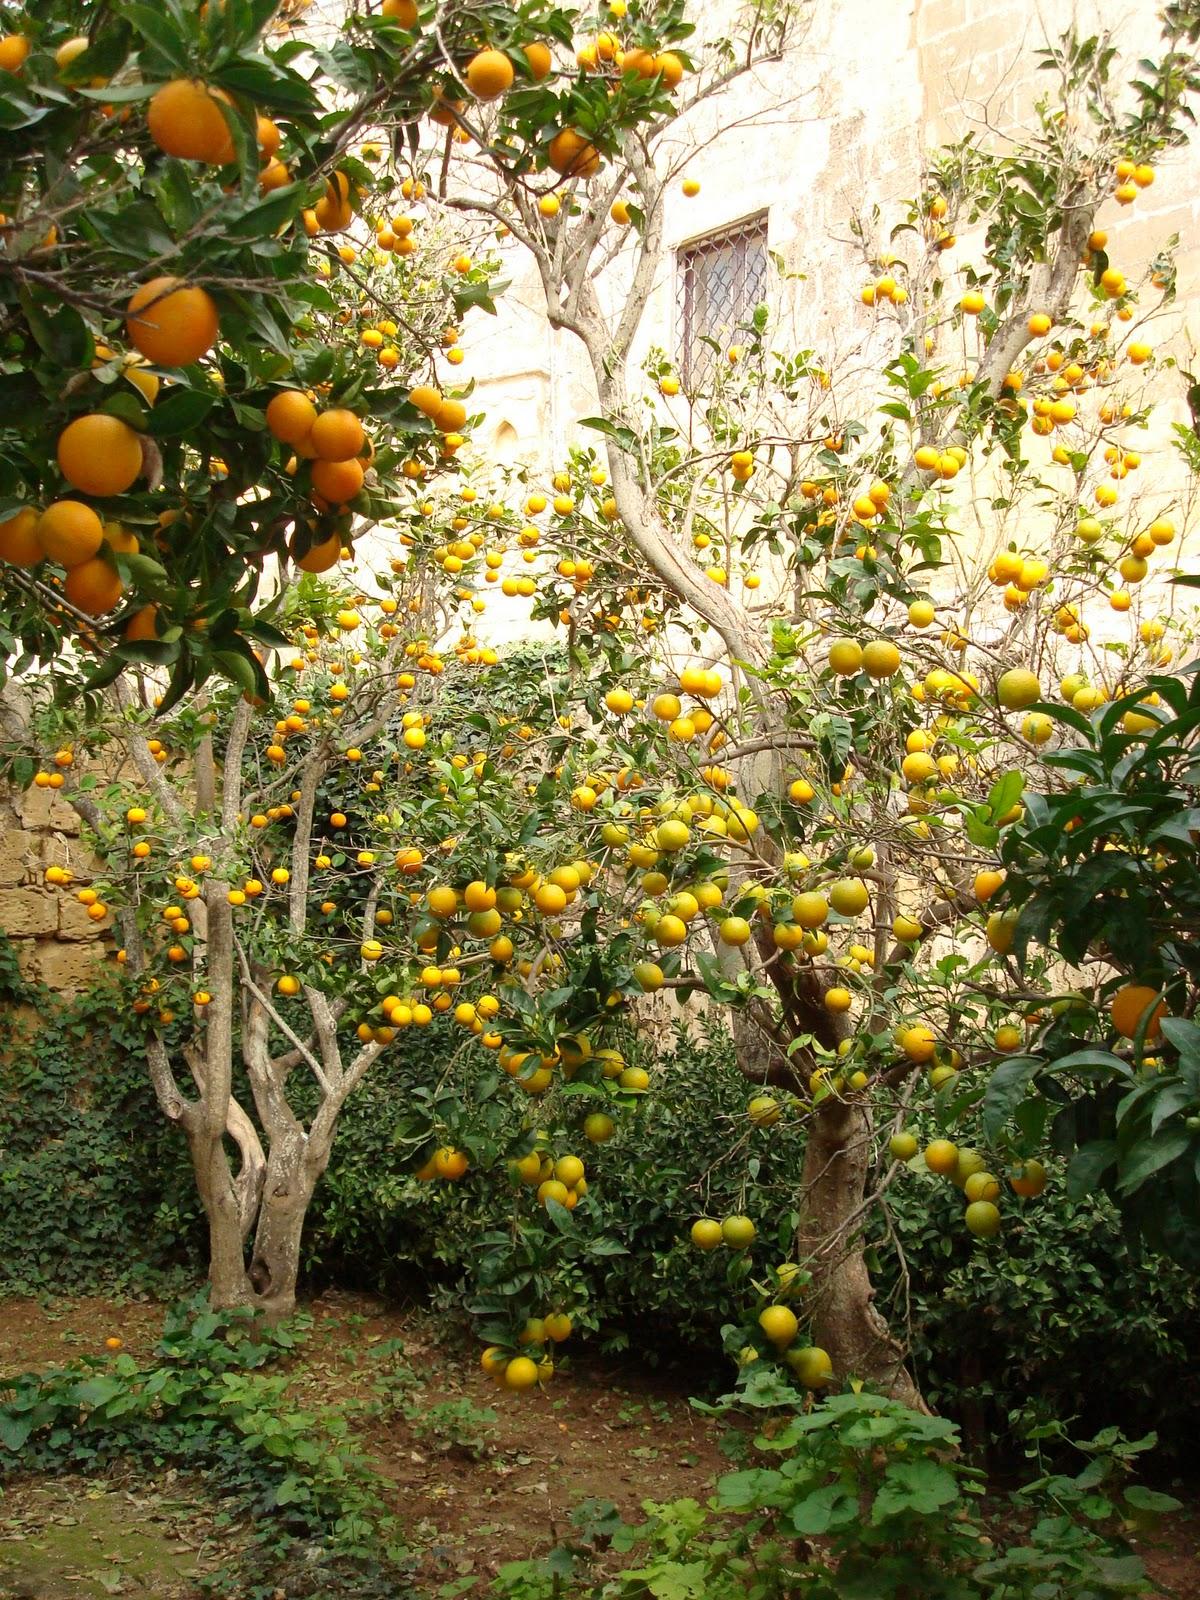 Christine's Chatter: In a Maltese garden